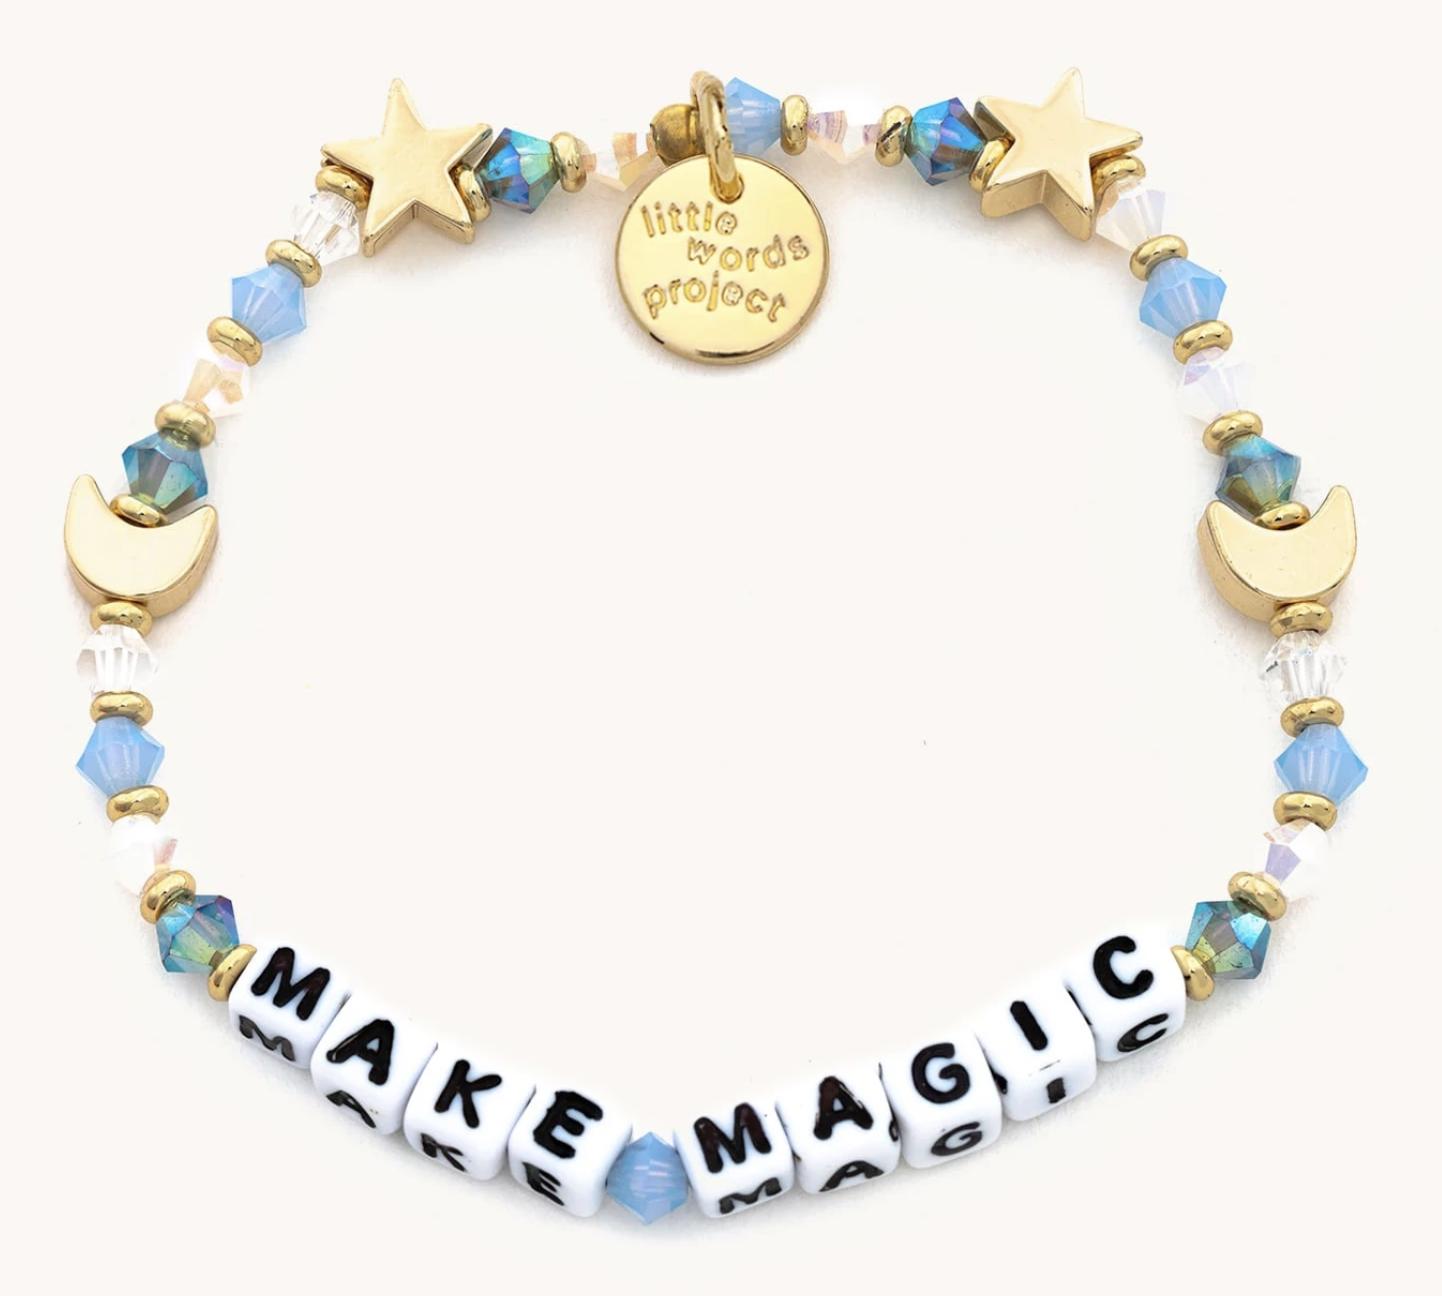 Little Words Project Make Magic-White-Glass Slipper